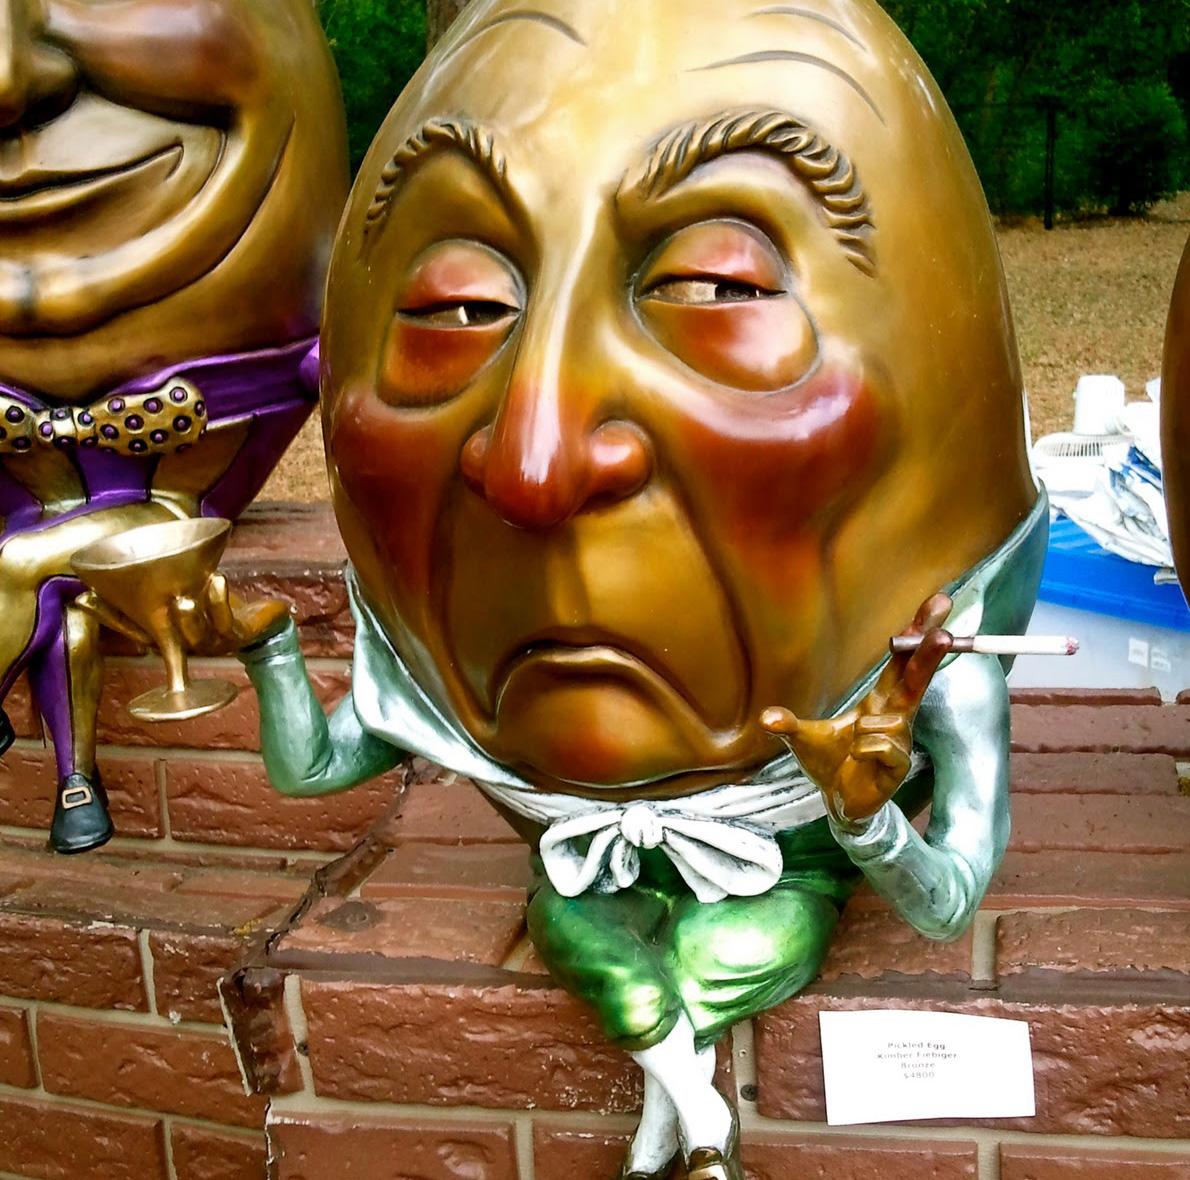 Humpty Dumpty and 'anti-Semitism'